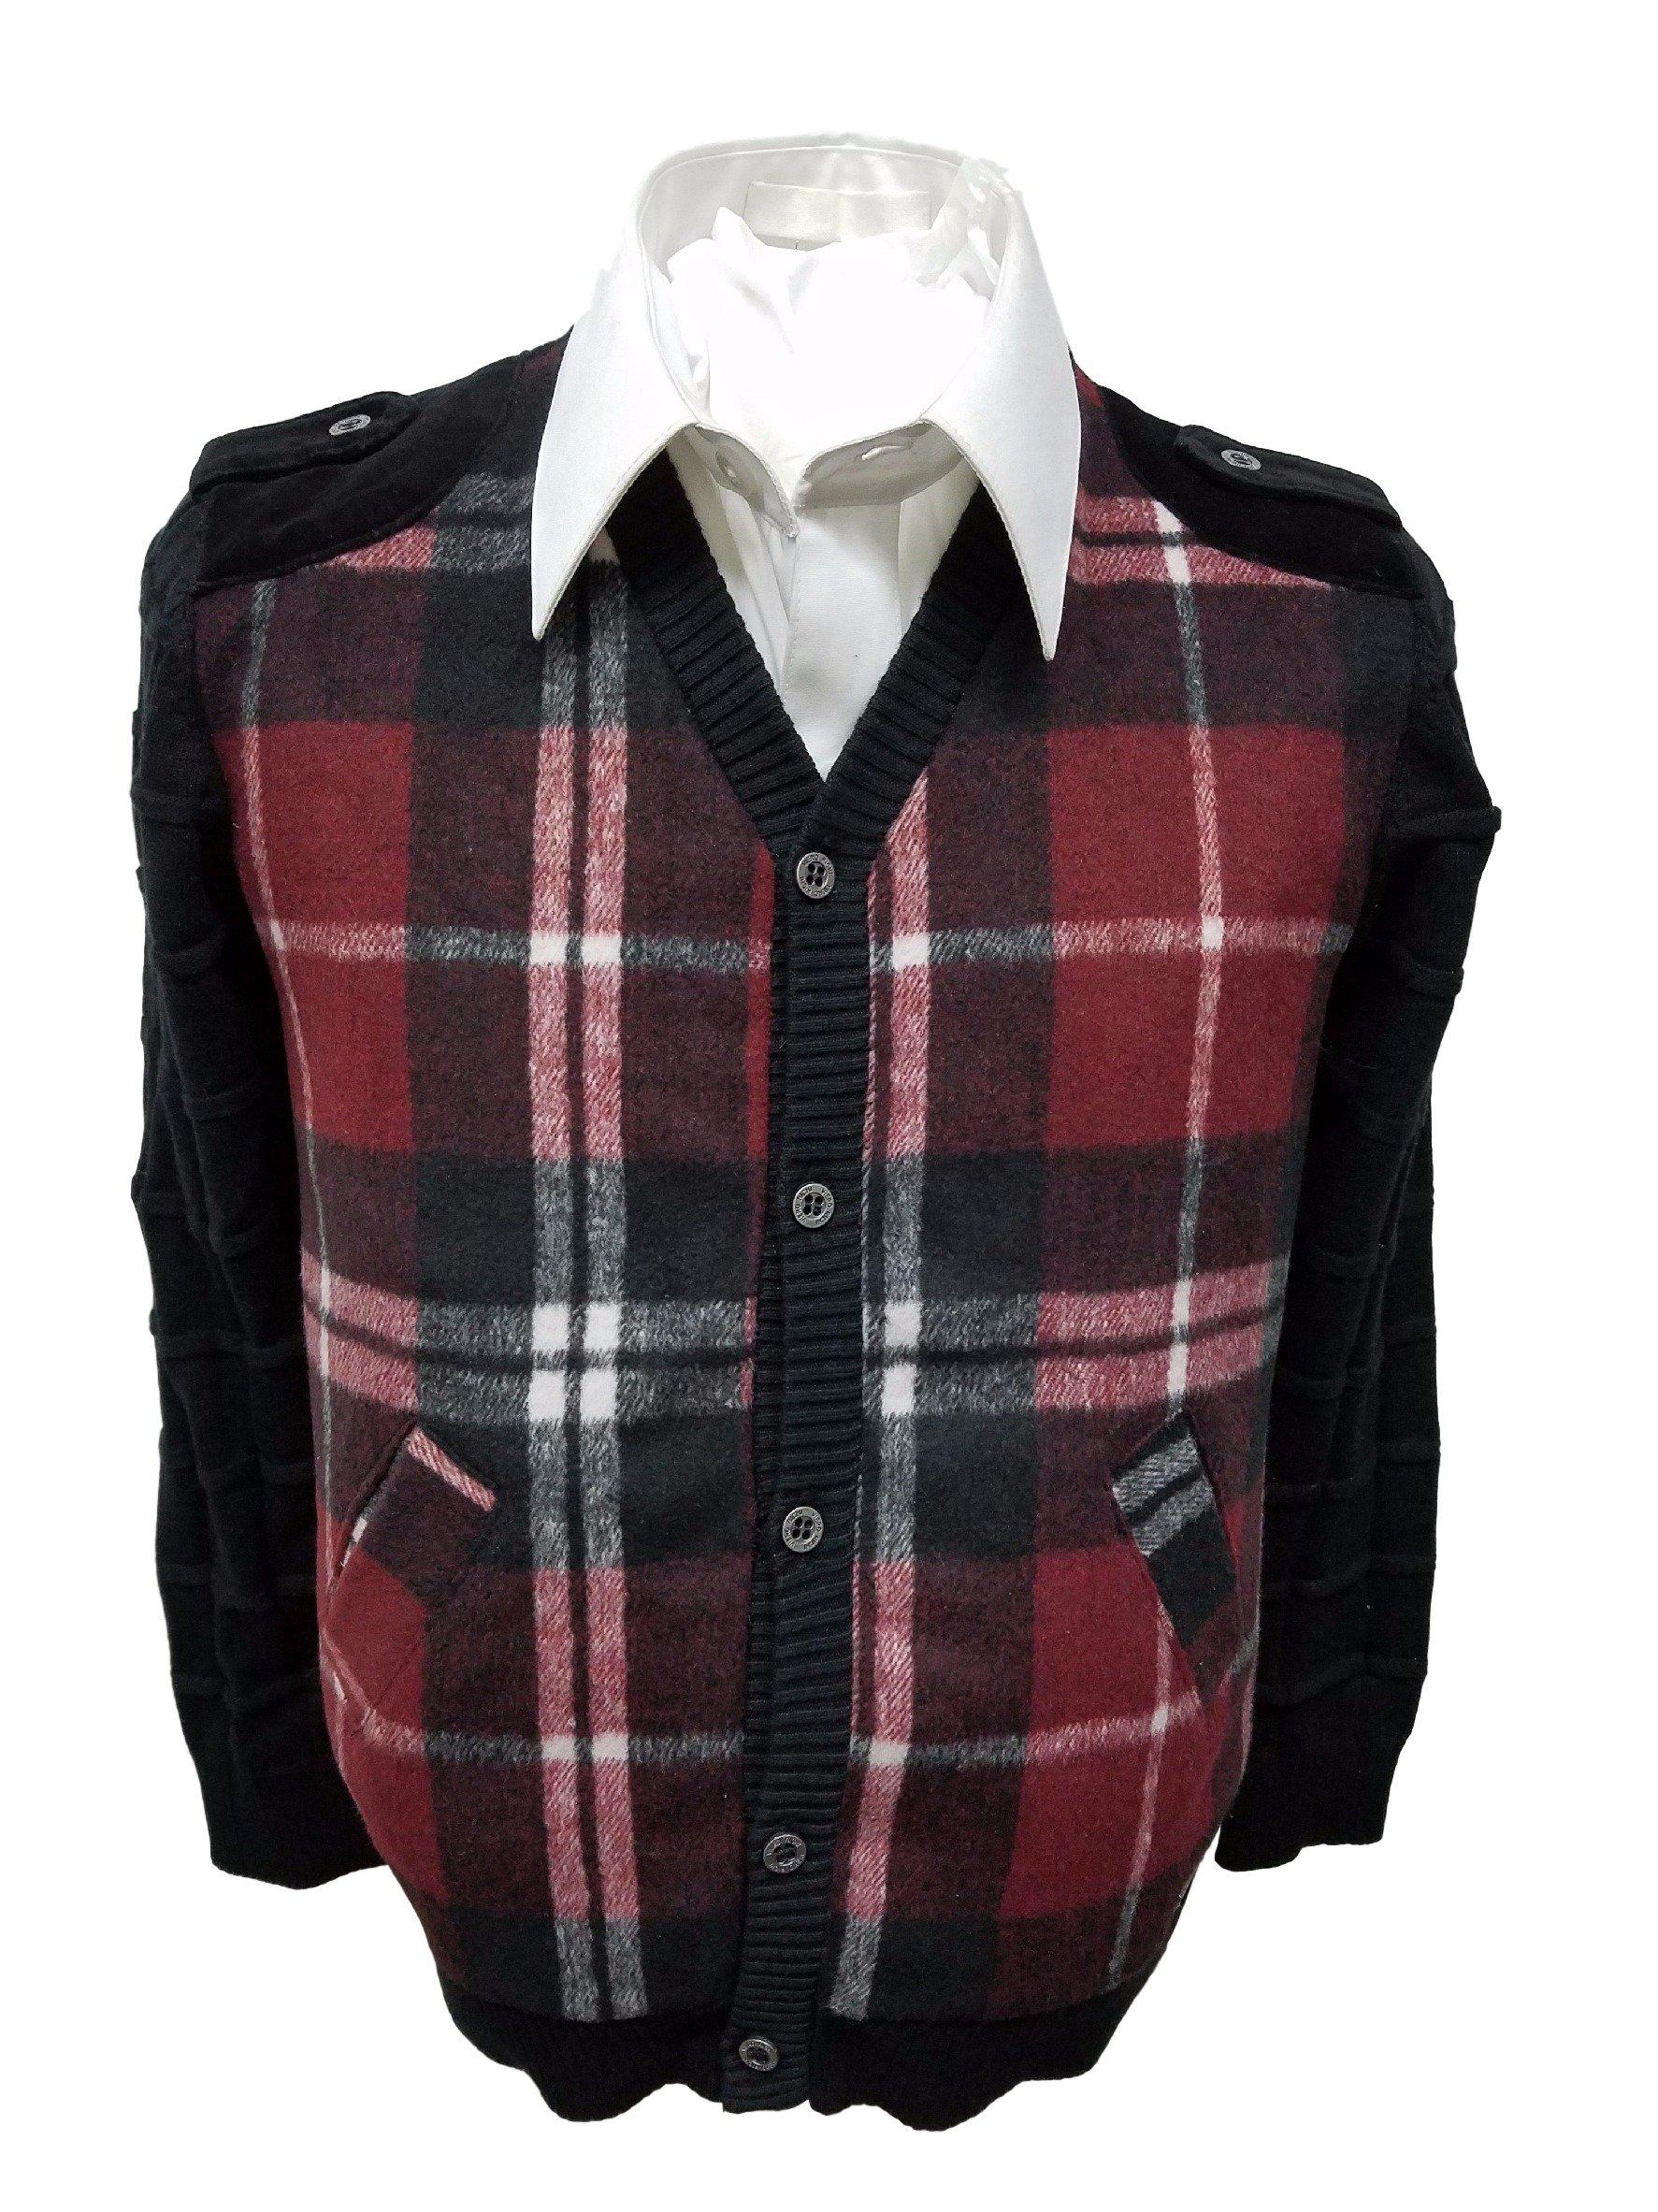 Viero Richi Cardigan Sweater 100% Cotton # 2372 (2)